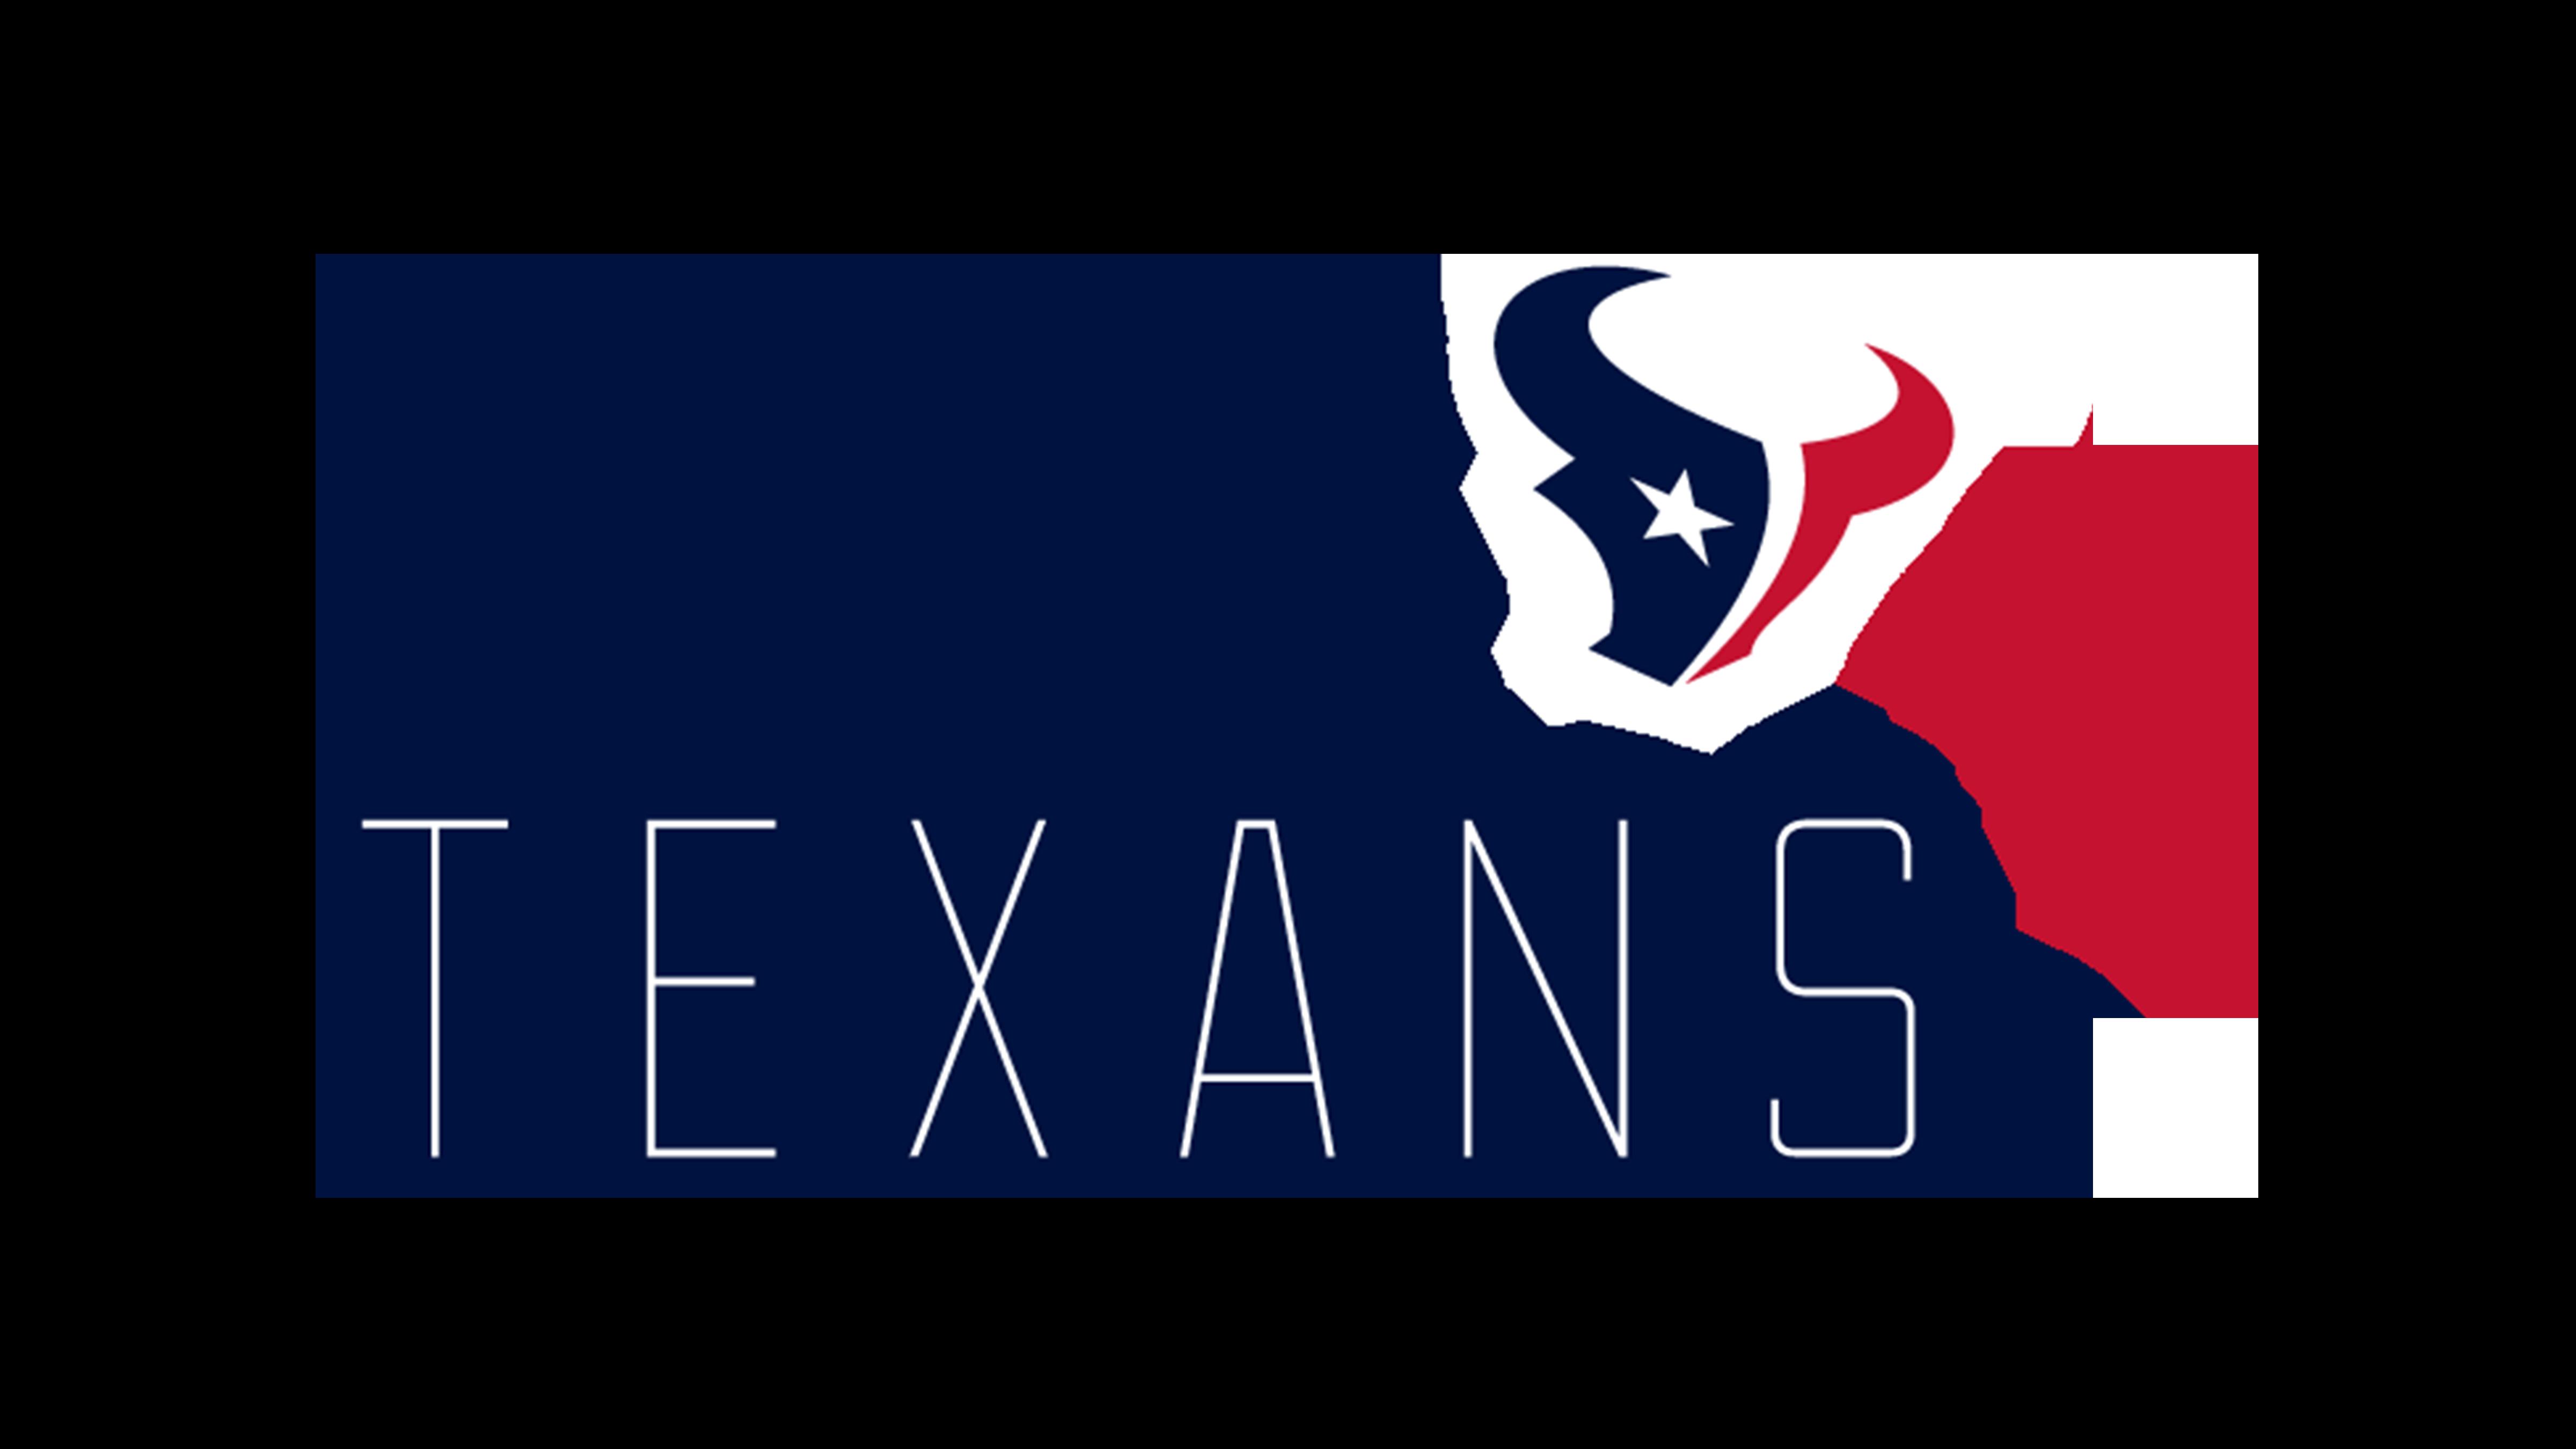 Puro Texans